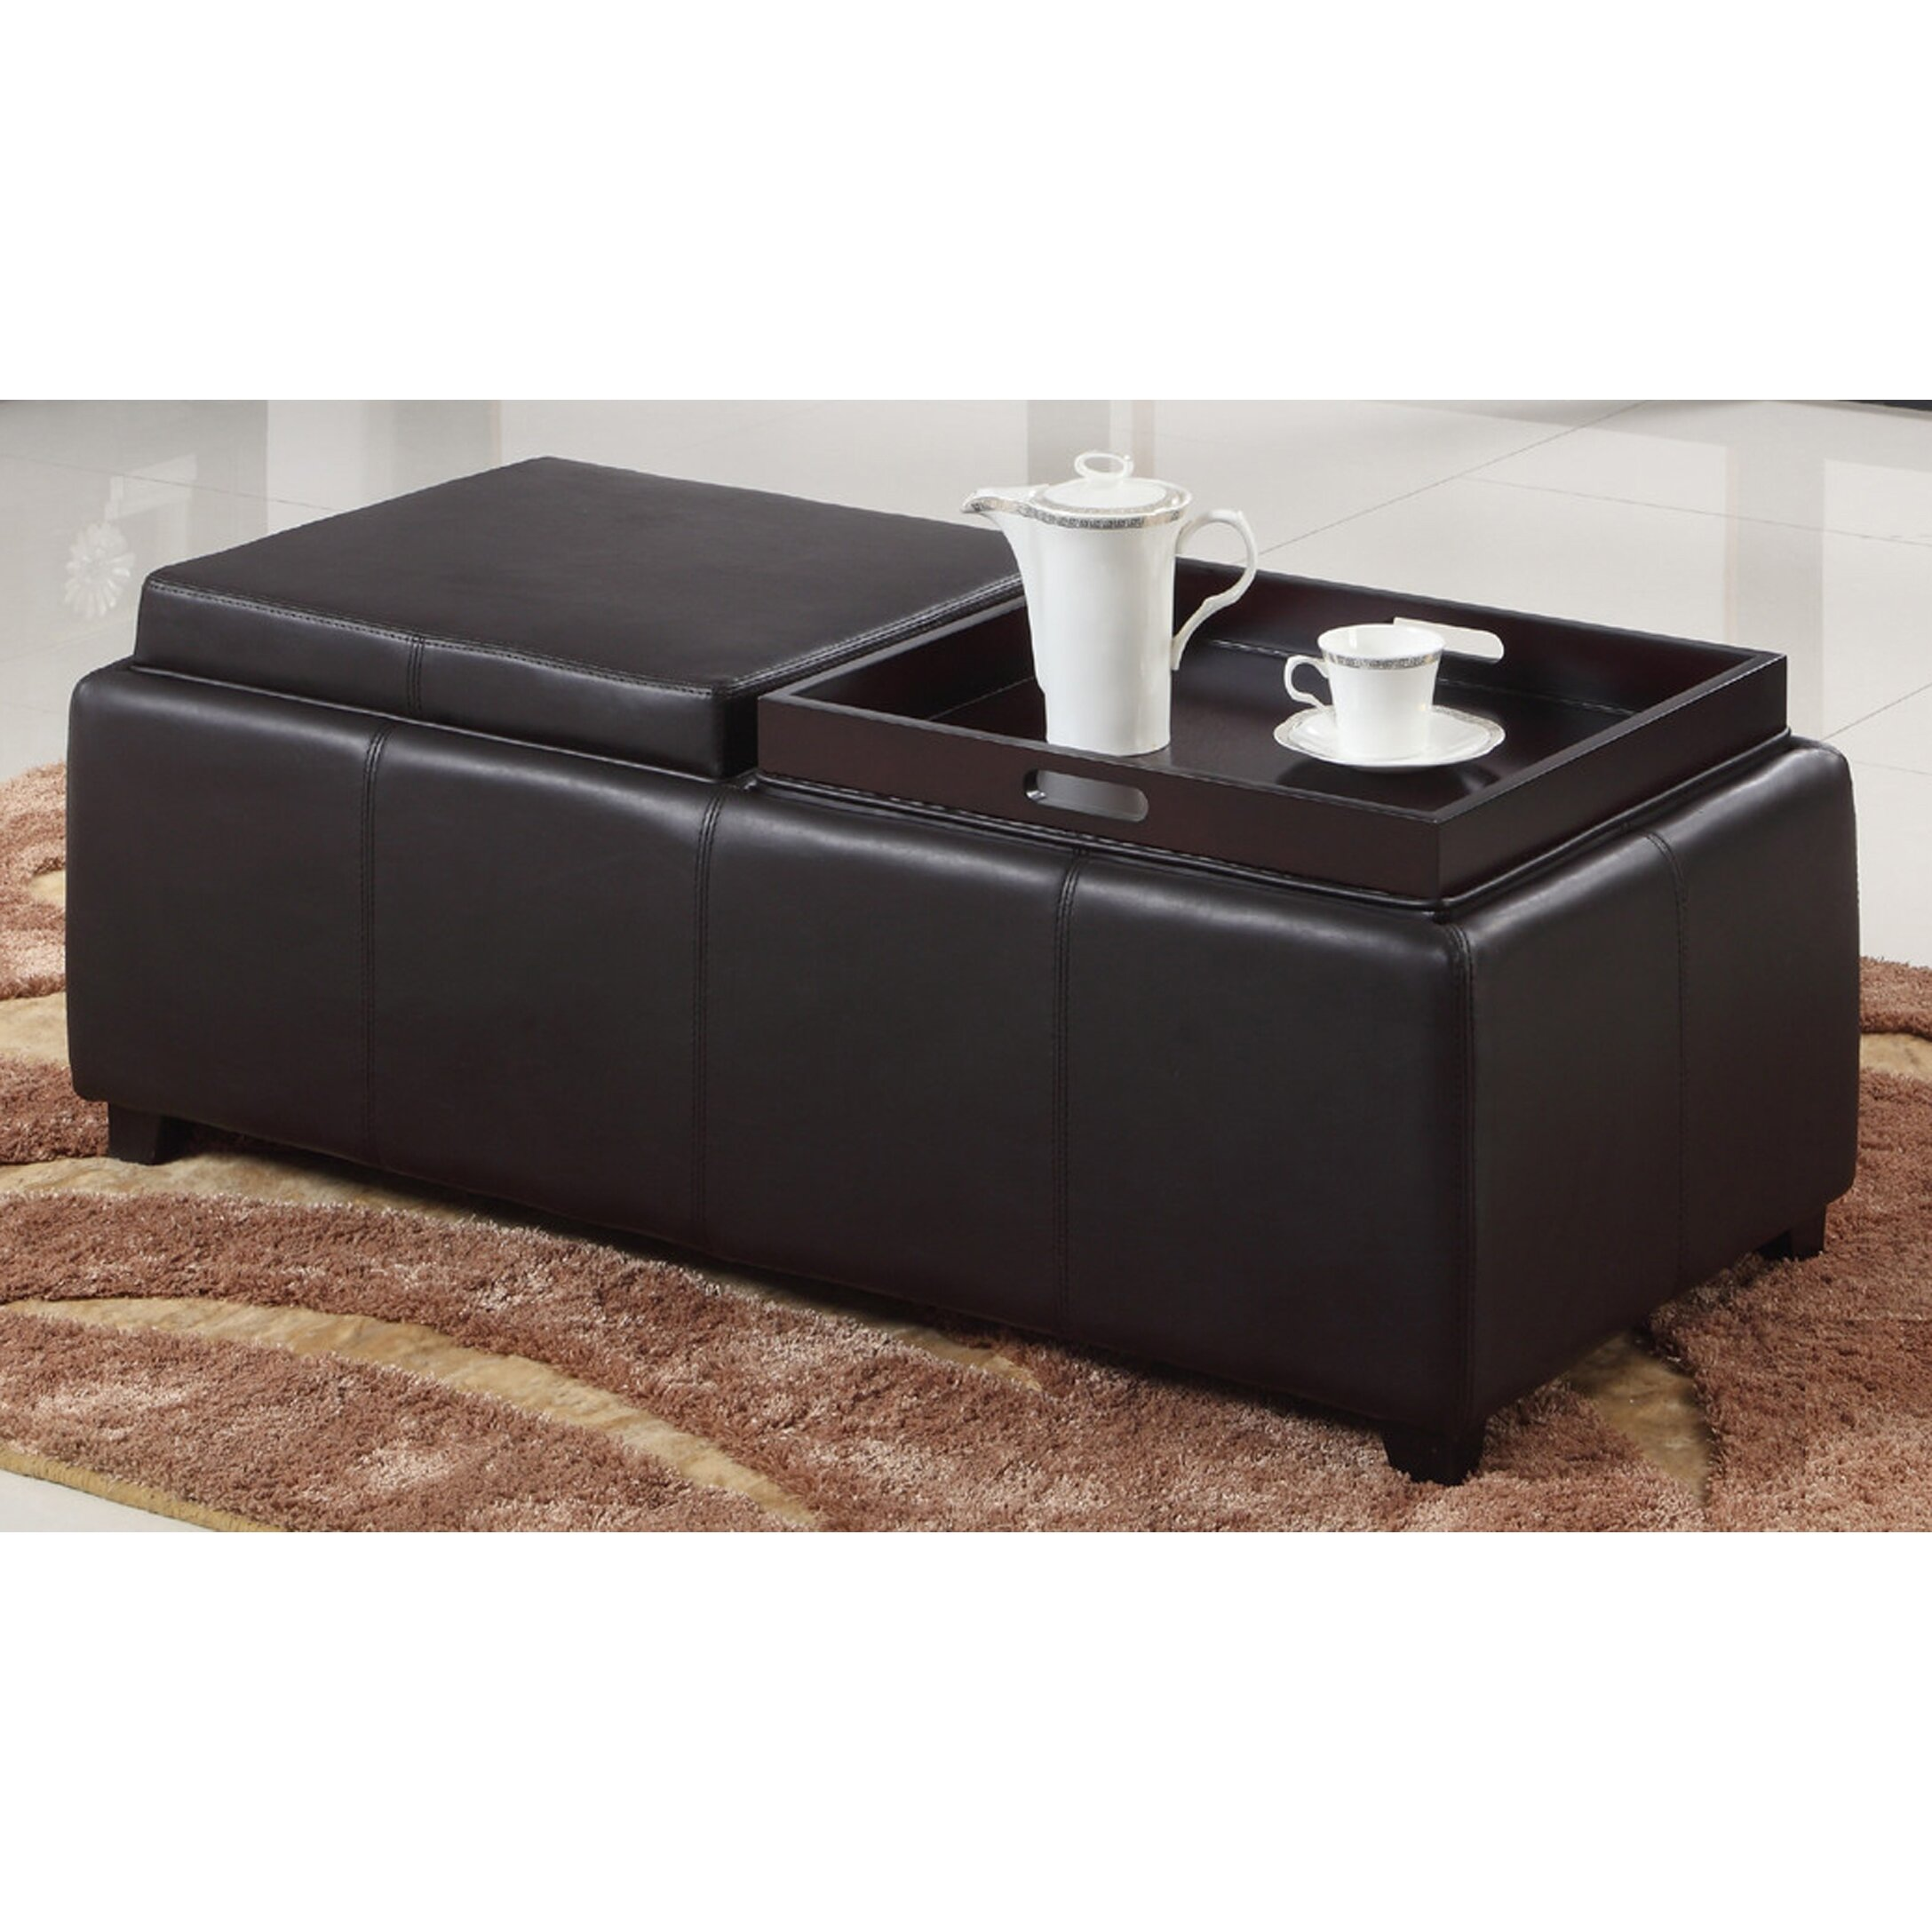 worldwide homefurnishings double tray storage ottoman